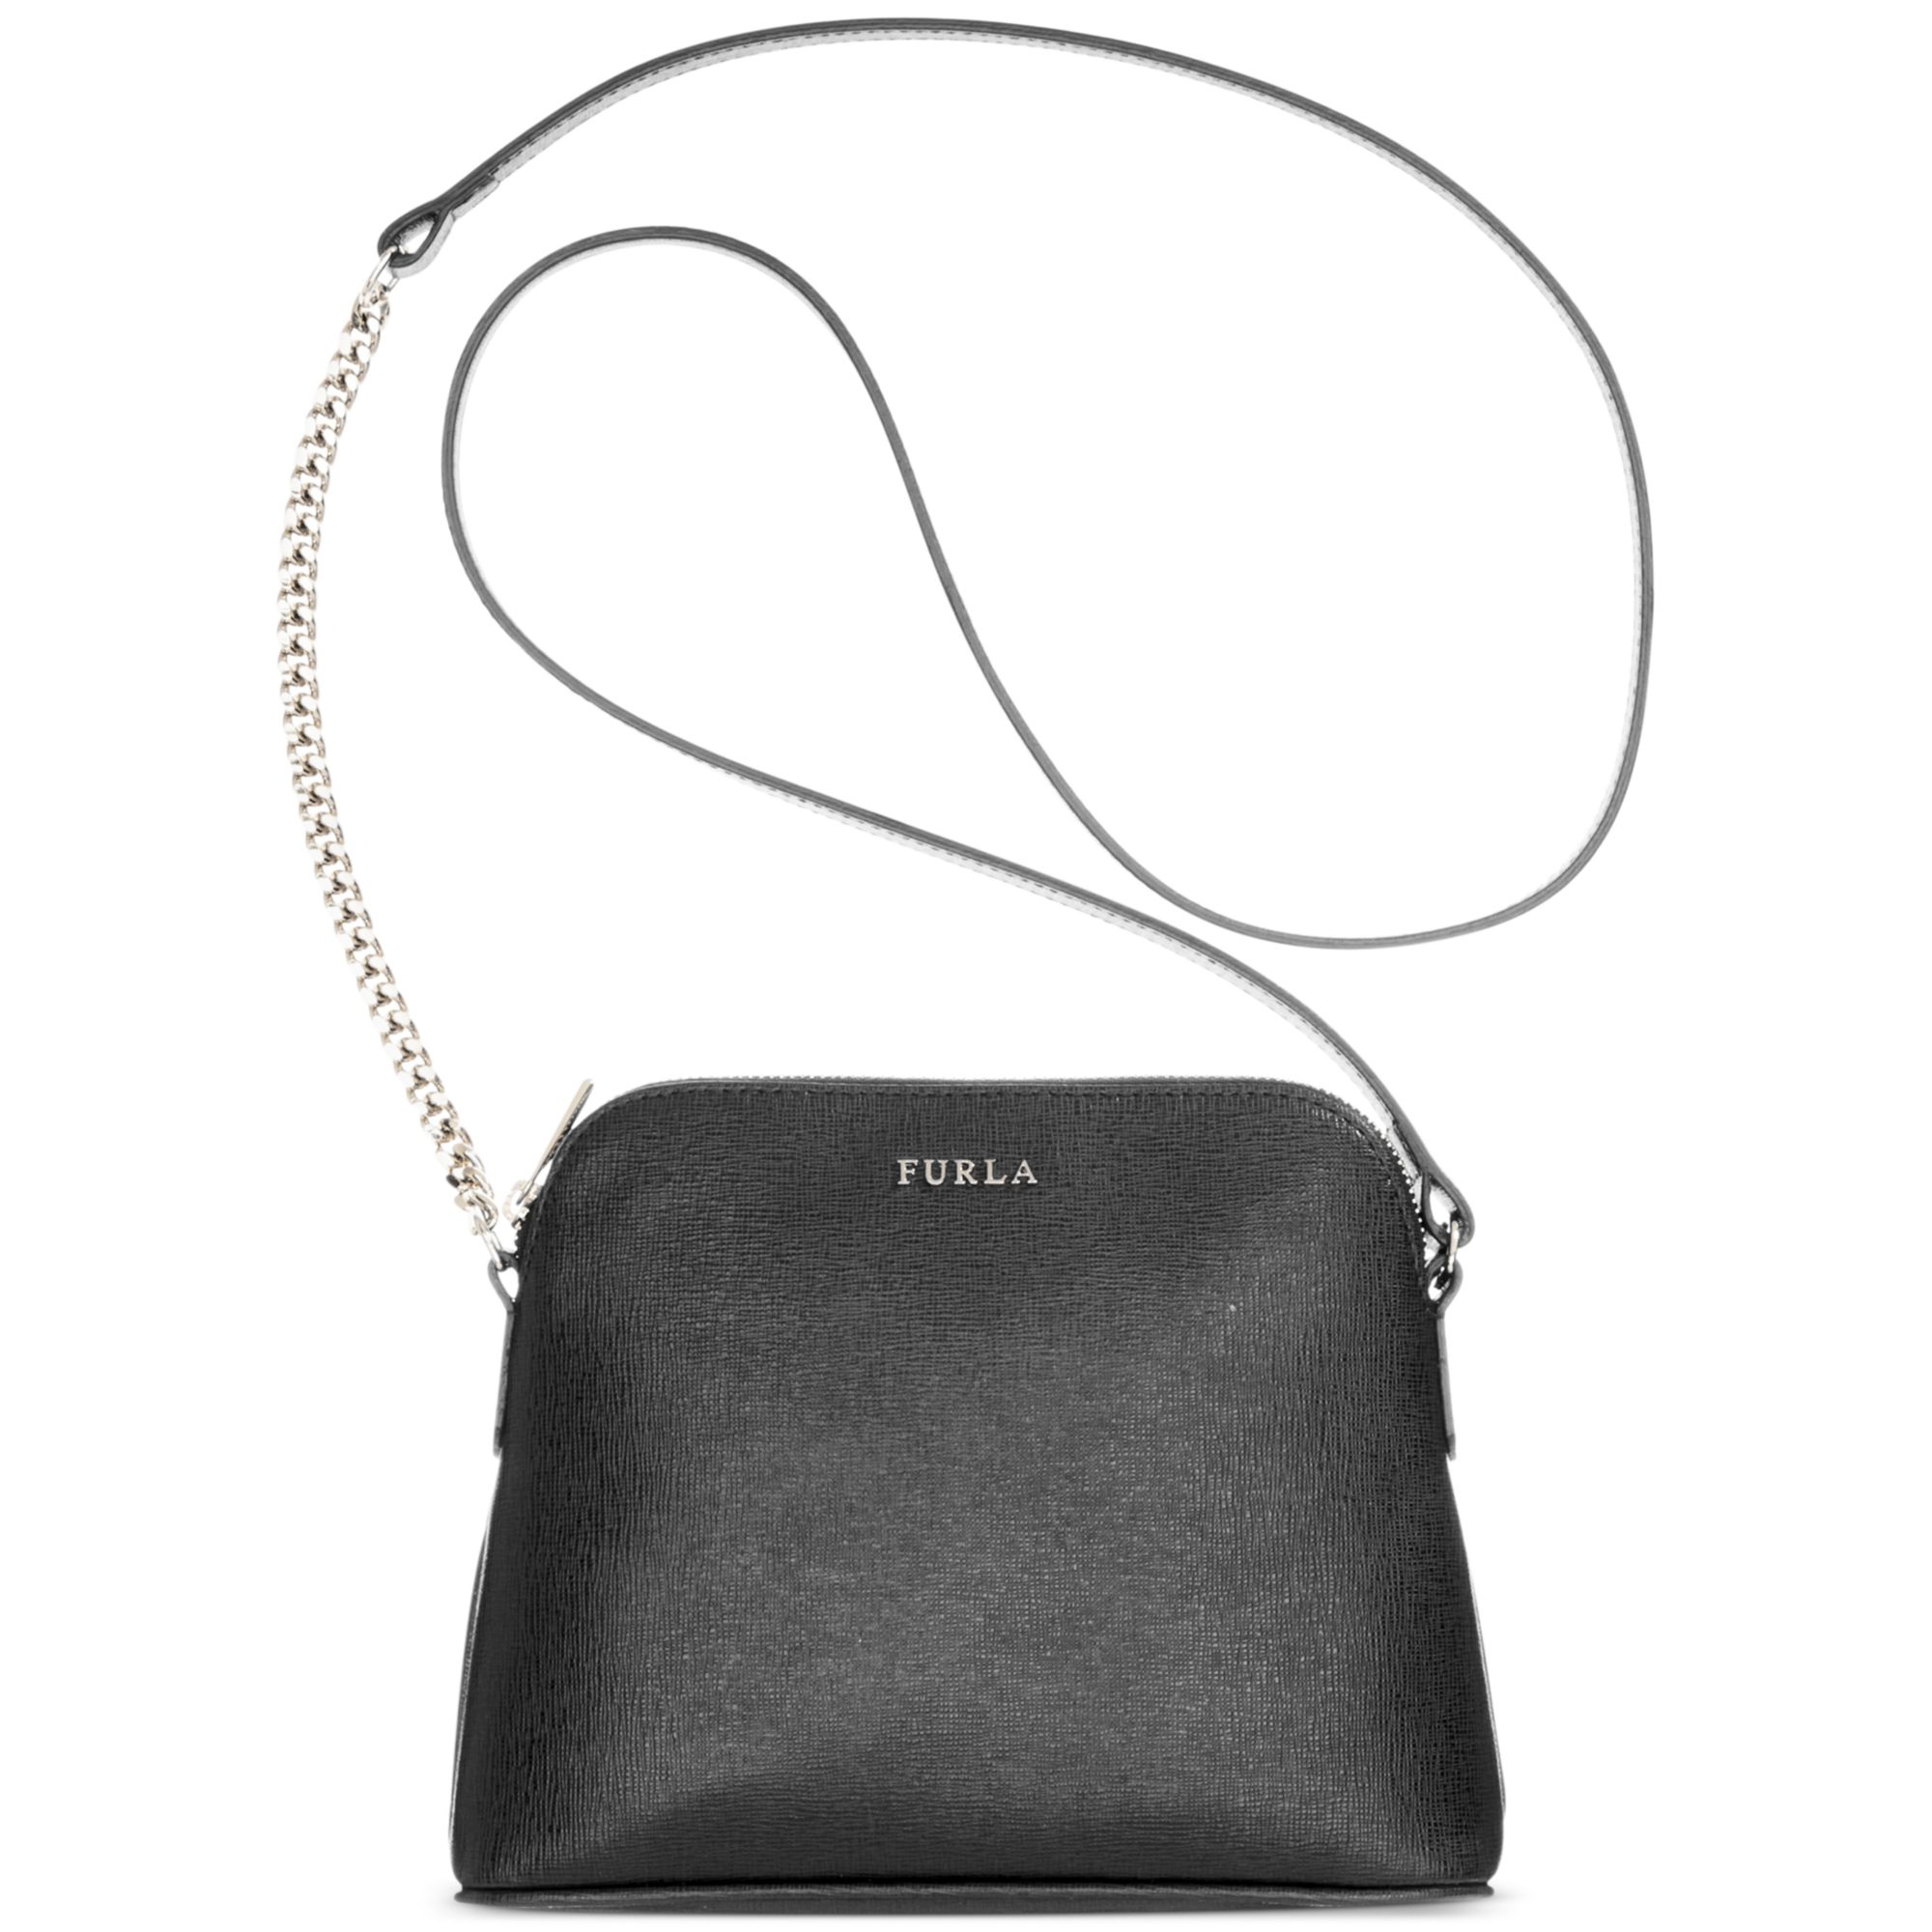 00c66552bbda Lyst - Furla Meridienne Large Minibag in Black